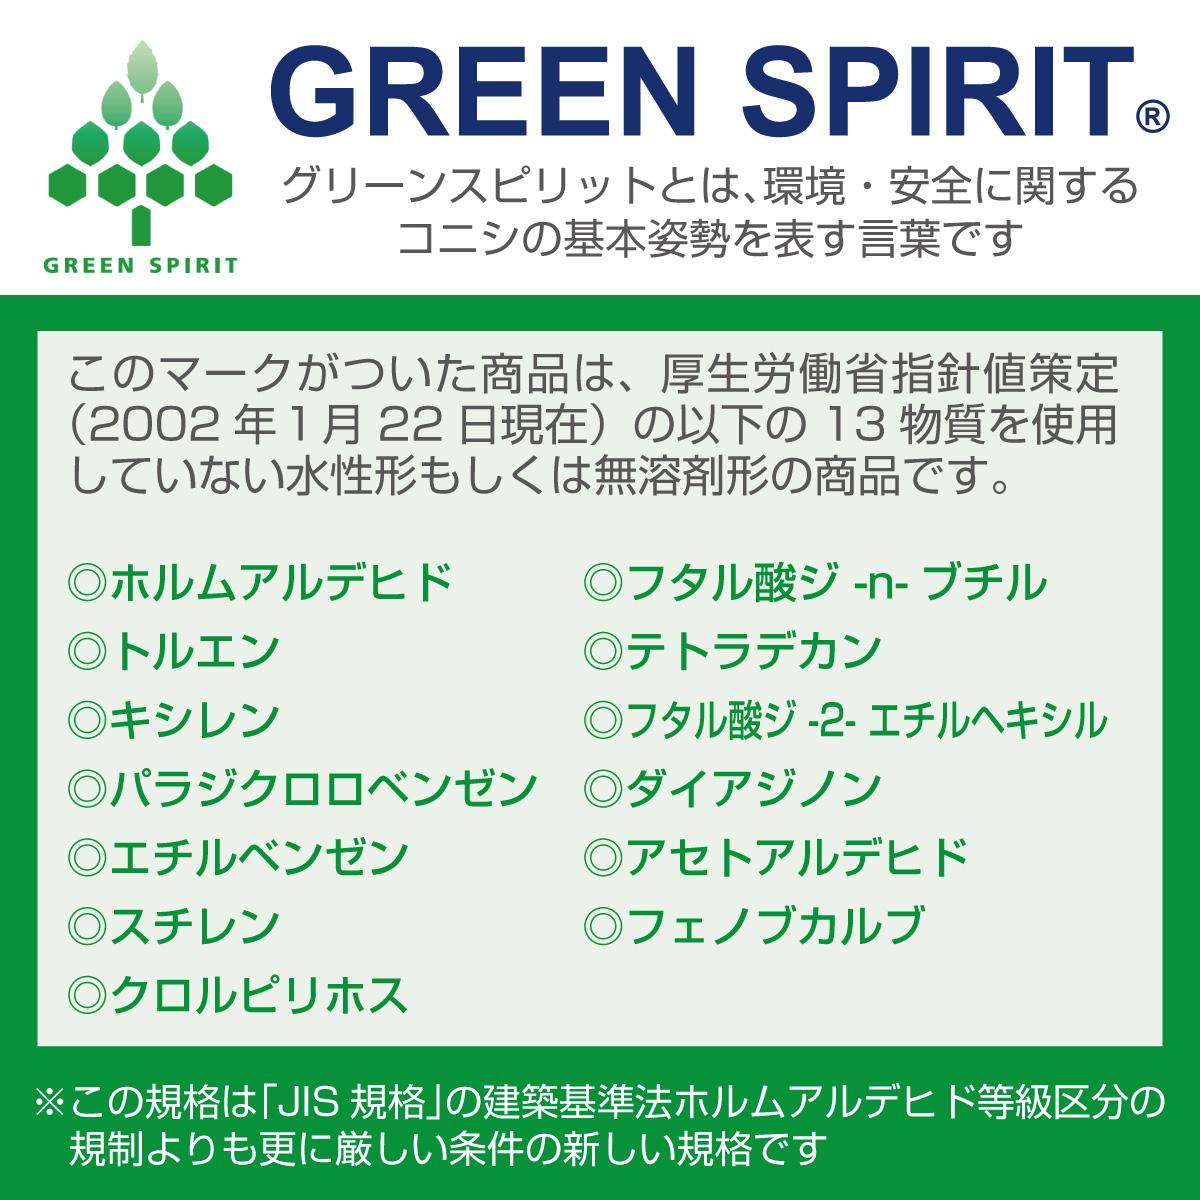 GREEN SPIRIT グリーンスピリットとは、環境・安全に関するコニシ基本姿勢を表す言葉です このマークがついた商品は、厚生労働省指針値策定(2002年1月22日現在)の以下の13物質を使用していない水性形もしくは無溶剤系の商品です。◎ホルムアルデヒド ◎トルエン ◎キシレン ◎パラジクロロベンゼン ◎エチルベンゼン ◎スチレン ◎クロルピリホス ◎フタル酸ジ -n-ブチル ◎テトラデカン ◎フタル酸ジ -2- エチルヘキシル ◎ダイアジノン ◎アセトアルデヒド ◎フェノブカルブ ※この規格は「JIS規格」の建築基準法ホルムアルデヒド等級区分の規制よりも更に厳しい条件の新しい規格です